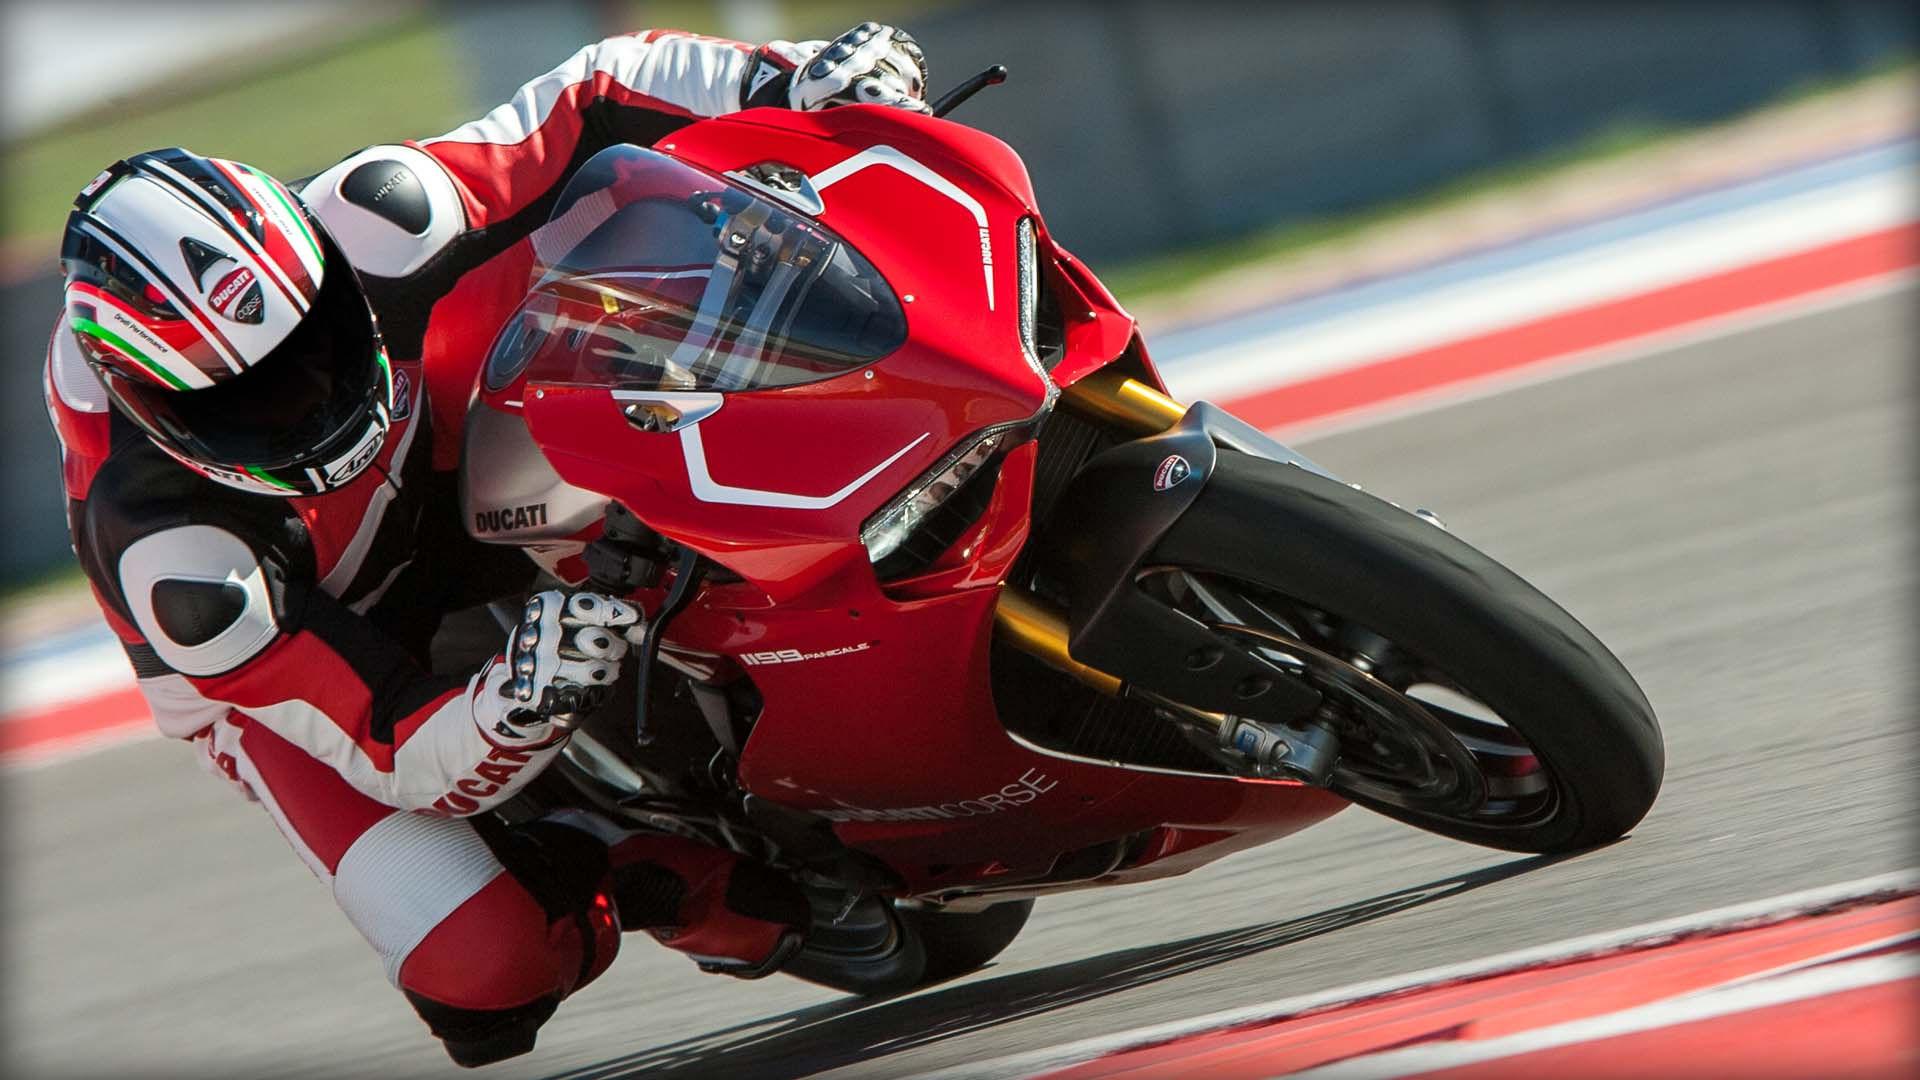 2014 Ducati  | Ducati 1199 Panigale R - Track Racing